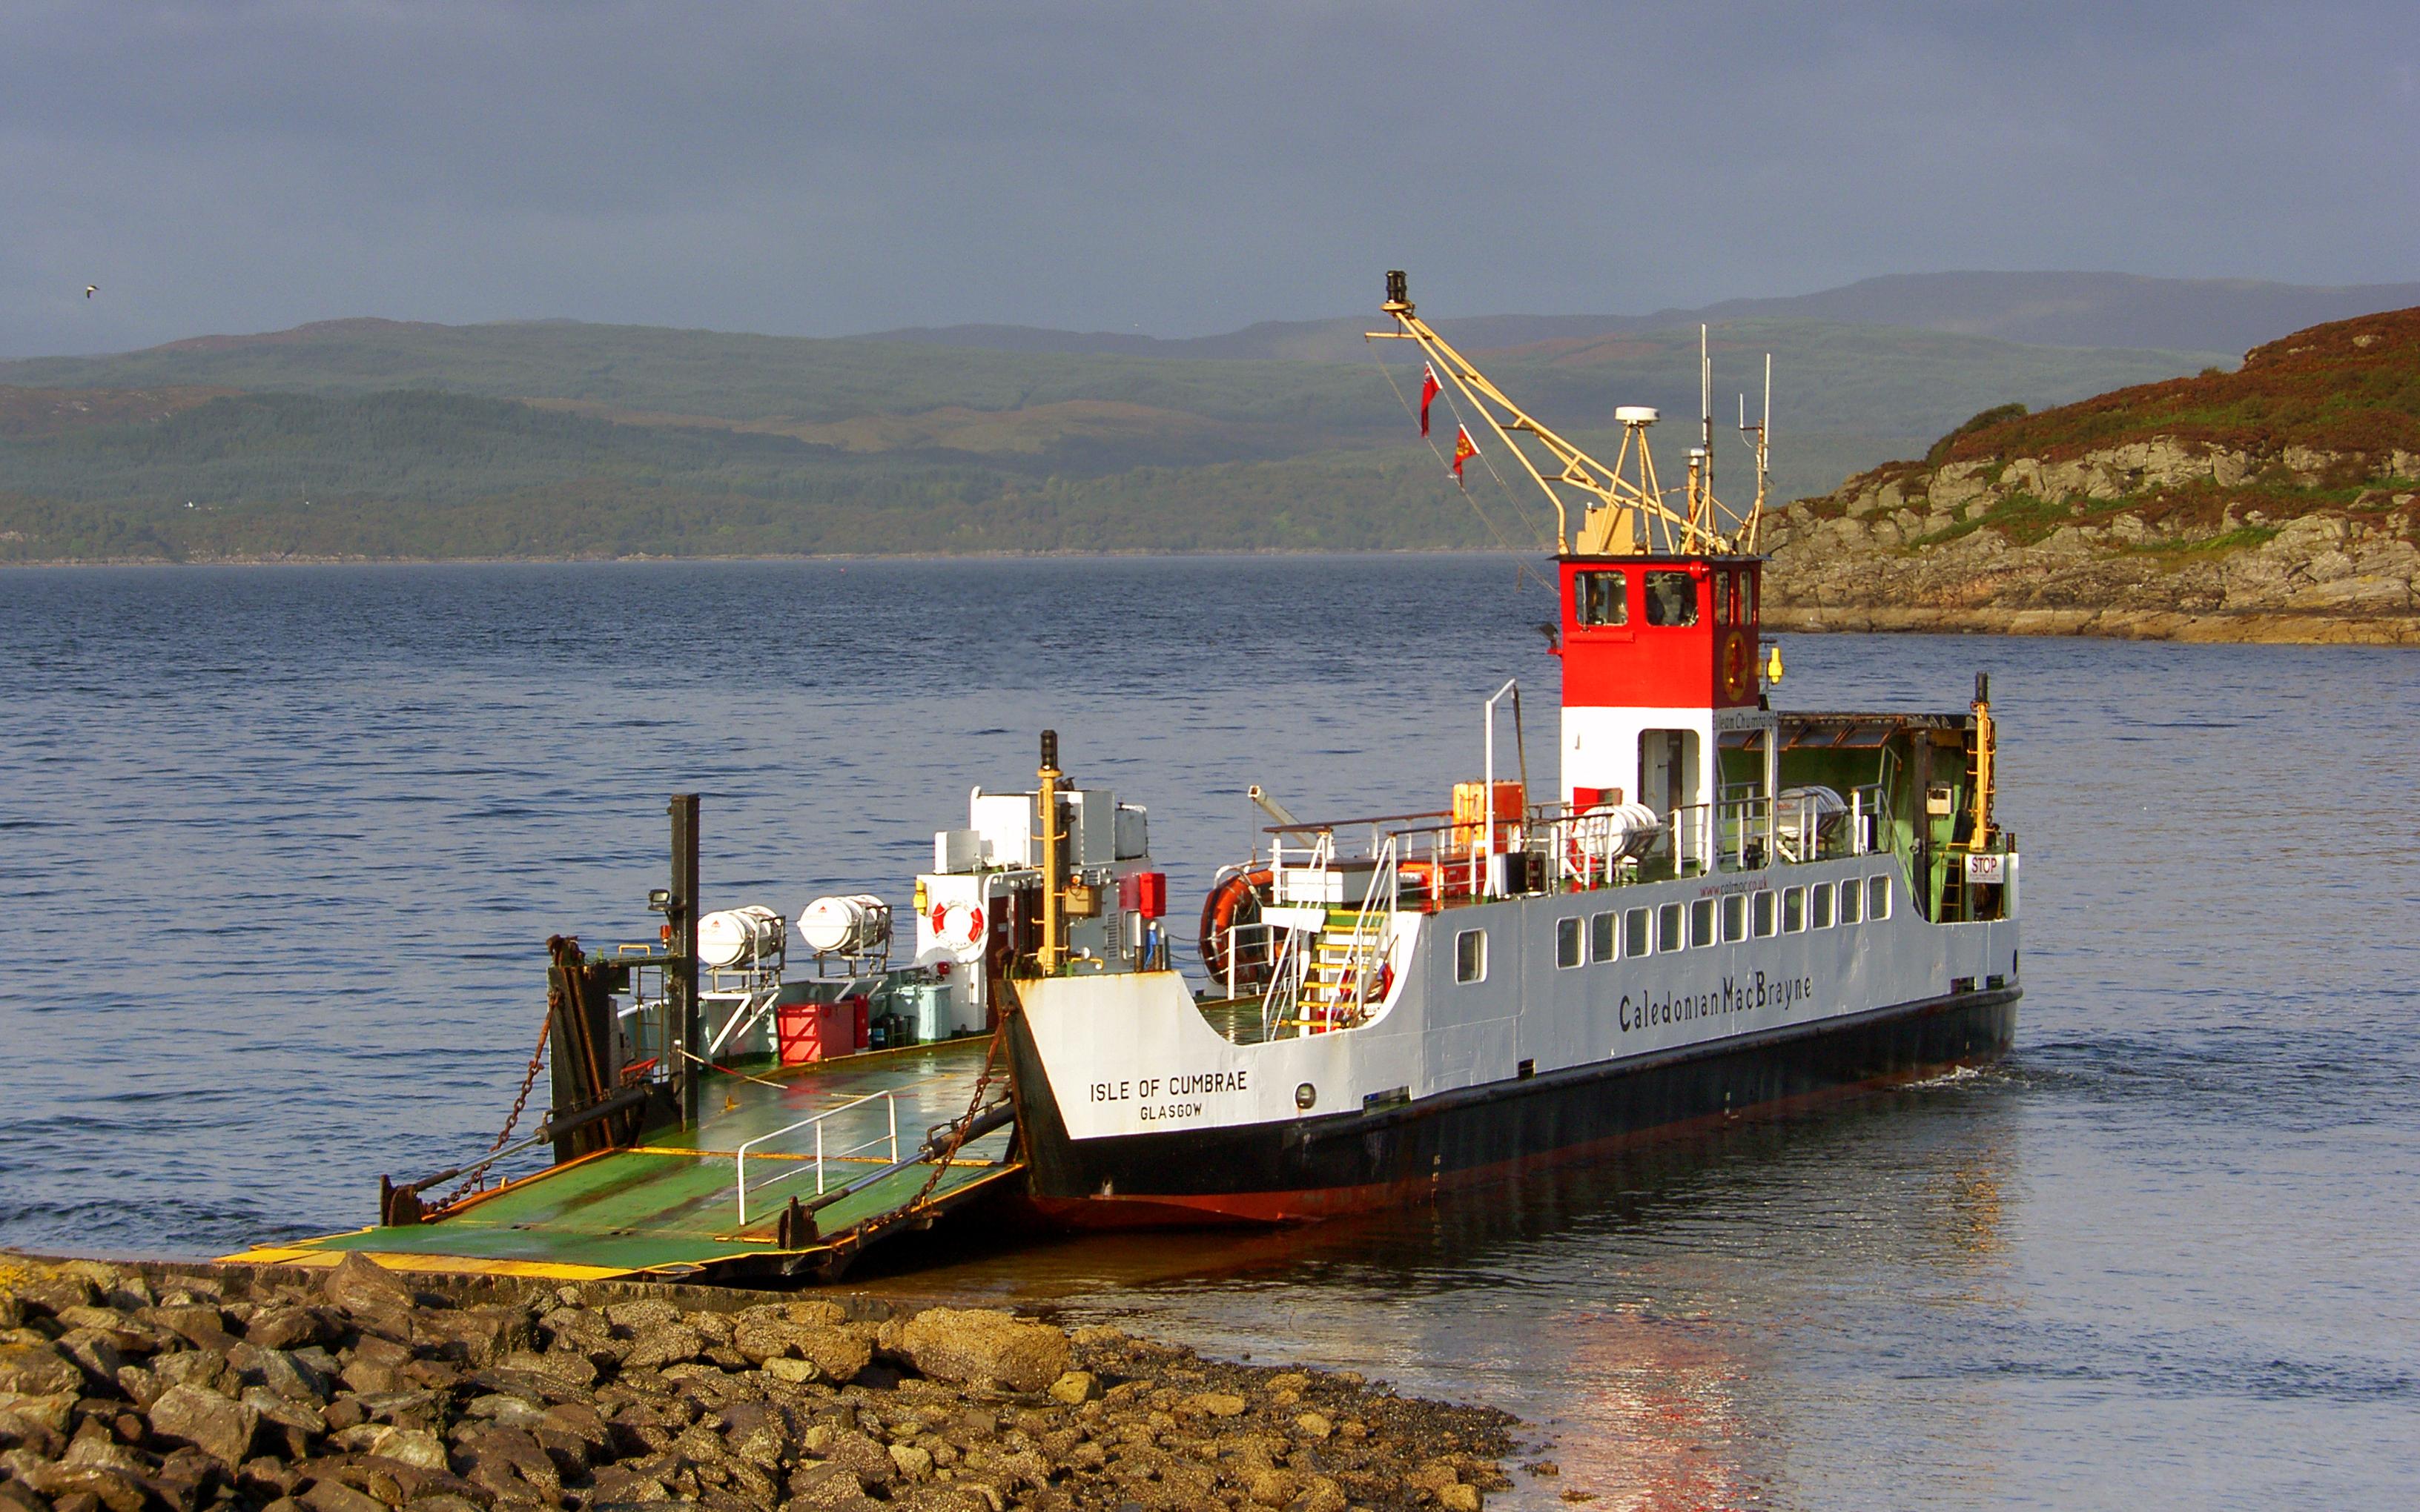 Isle of Cumbrae at Portavadie (Ships of CalMac)